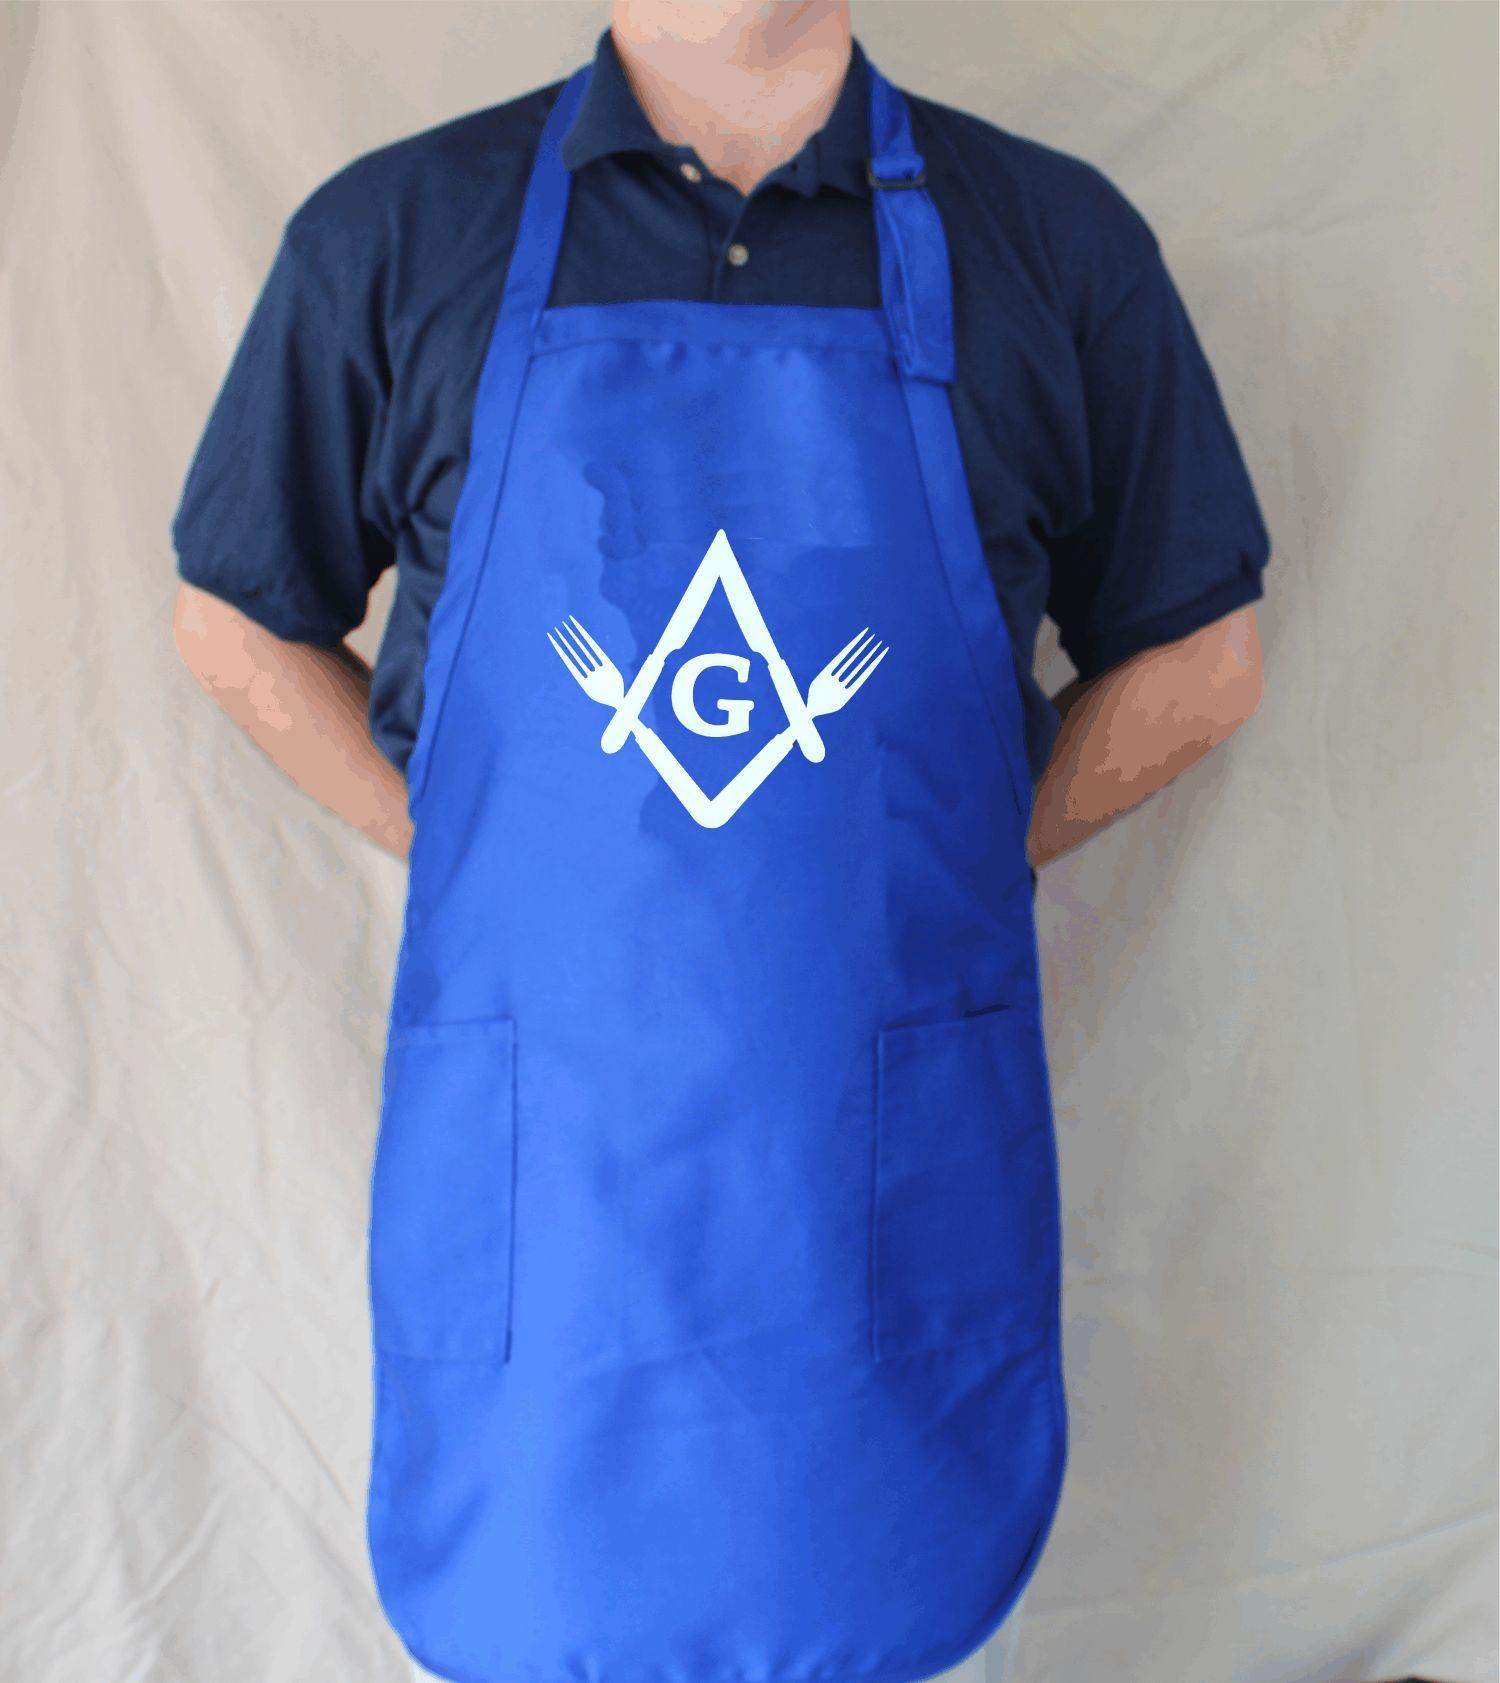 White apron in store - Masonic Bbq Apron Knife Fork Degree Royal Blue W White Print